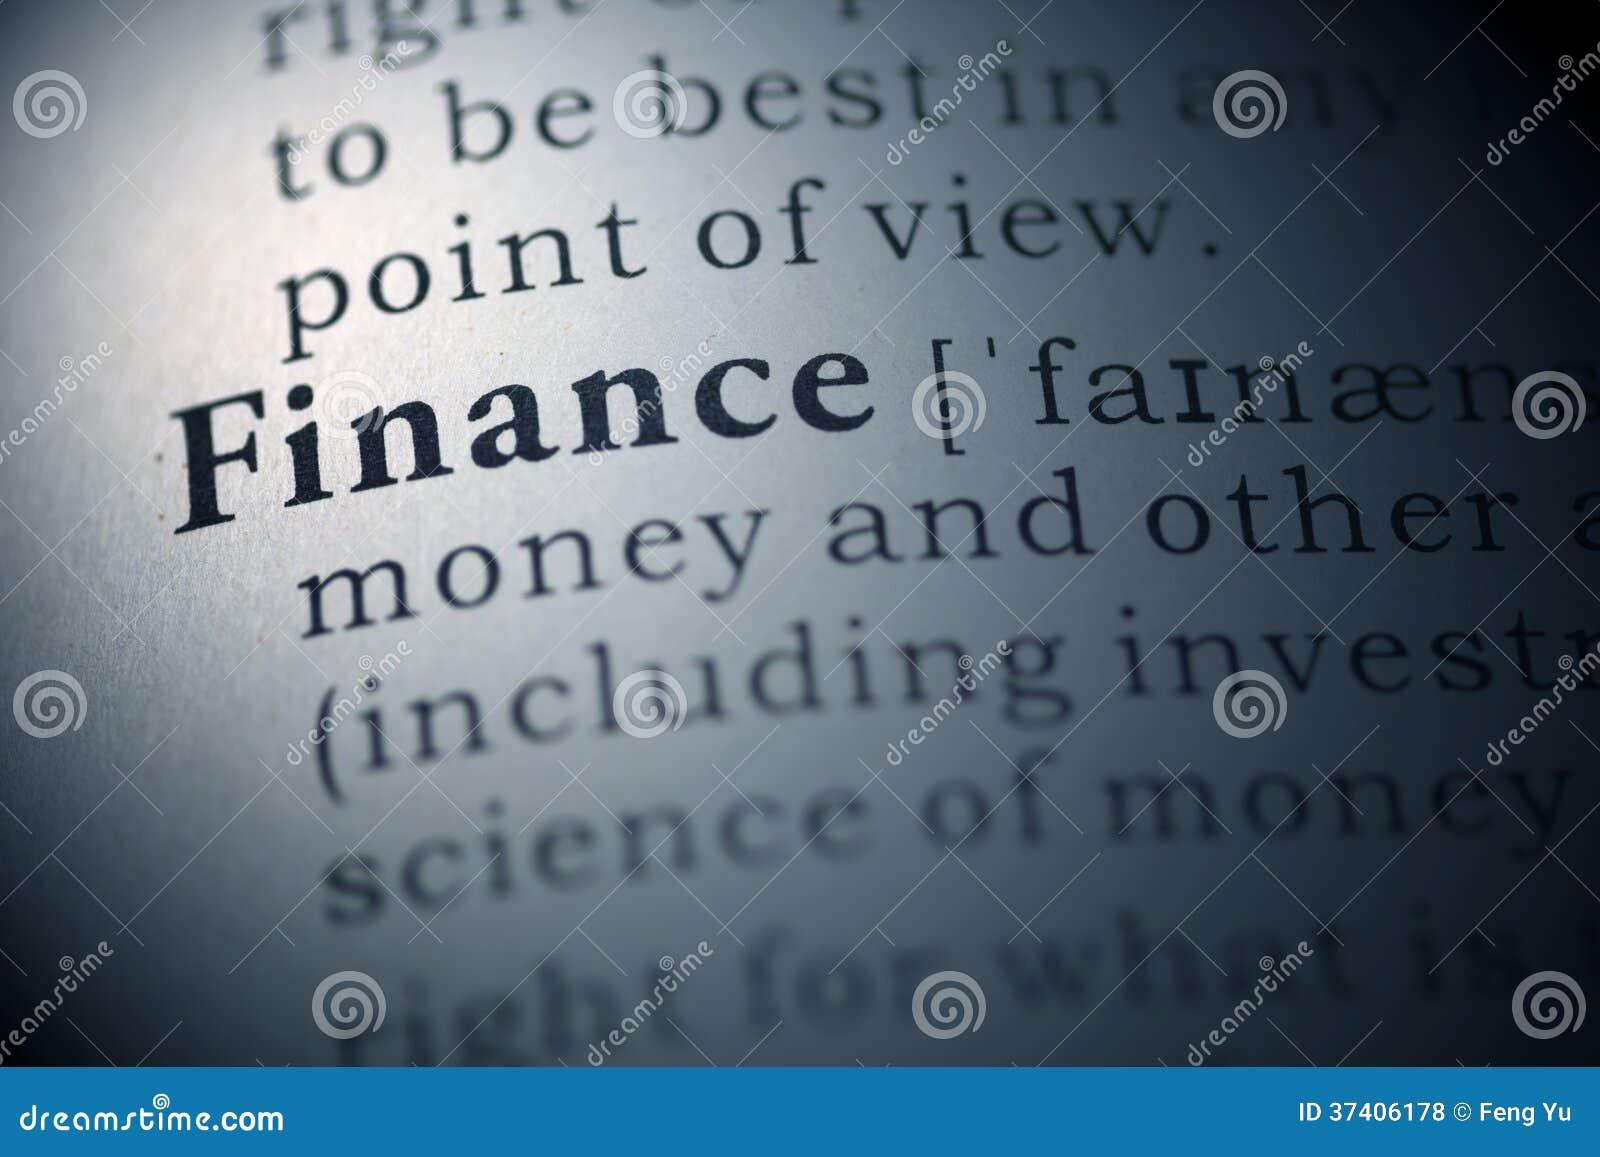 Finance Royalty Free Stock Photos - Image: 37406178